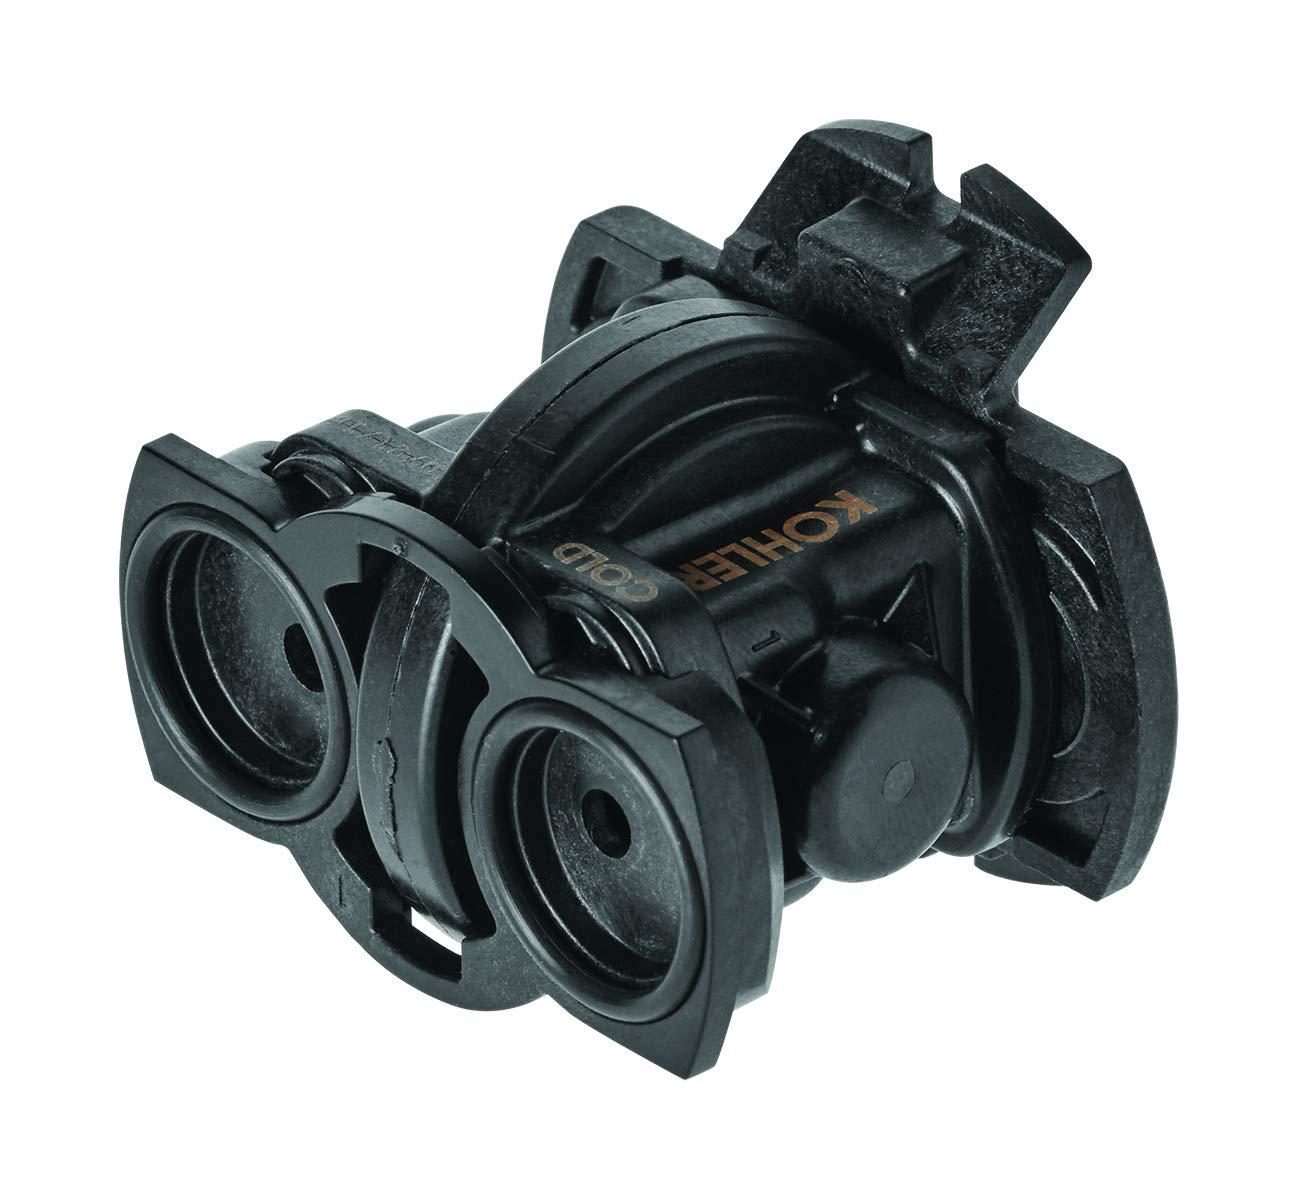 Kohler Part GP800820 Rite-Temp Pressure-Balancing Unit Cartridge, Black by Kohler (Image #2)